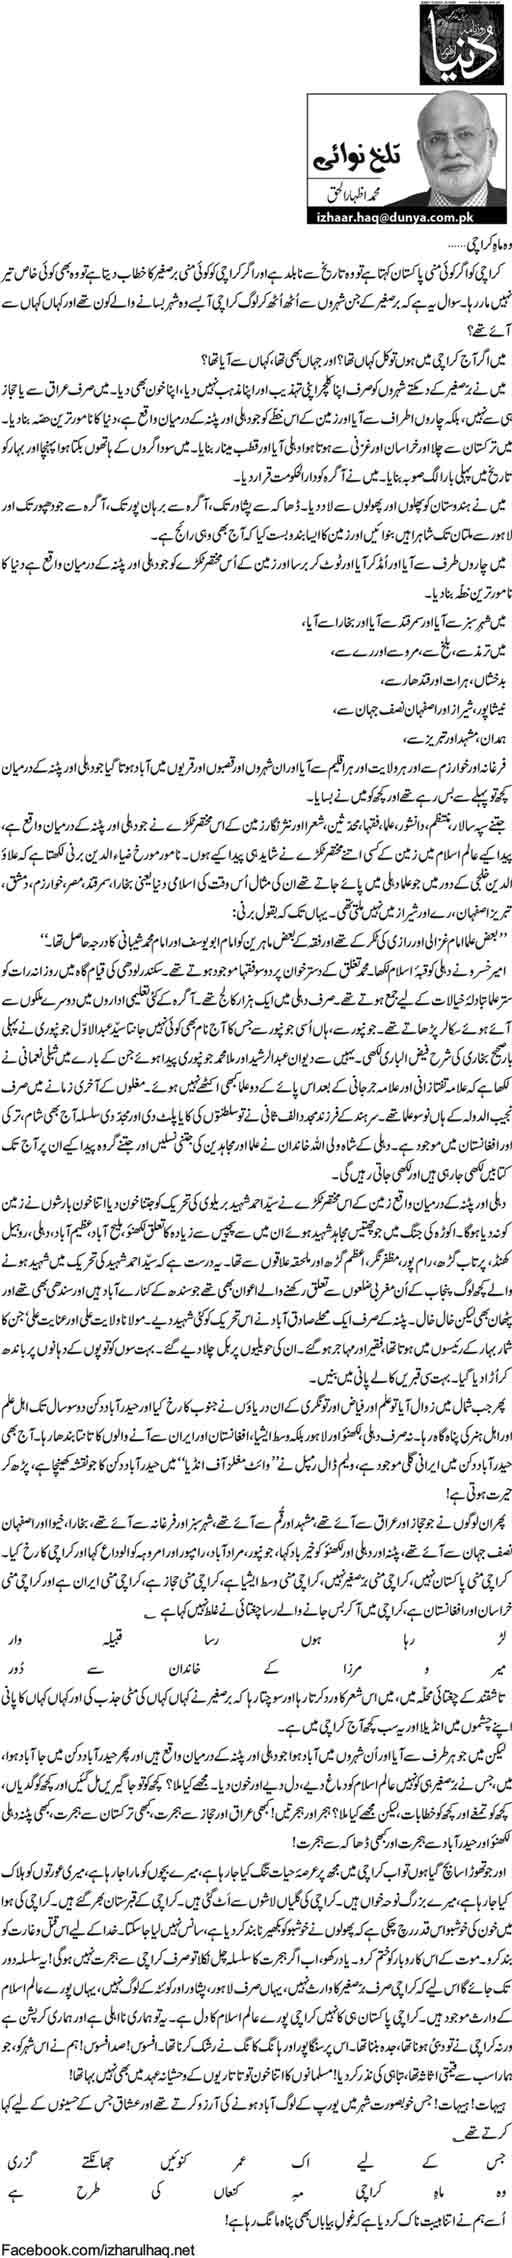 Woh mah e Karachi... - M. Izhar ul Haq